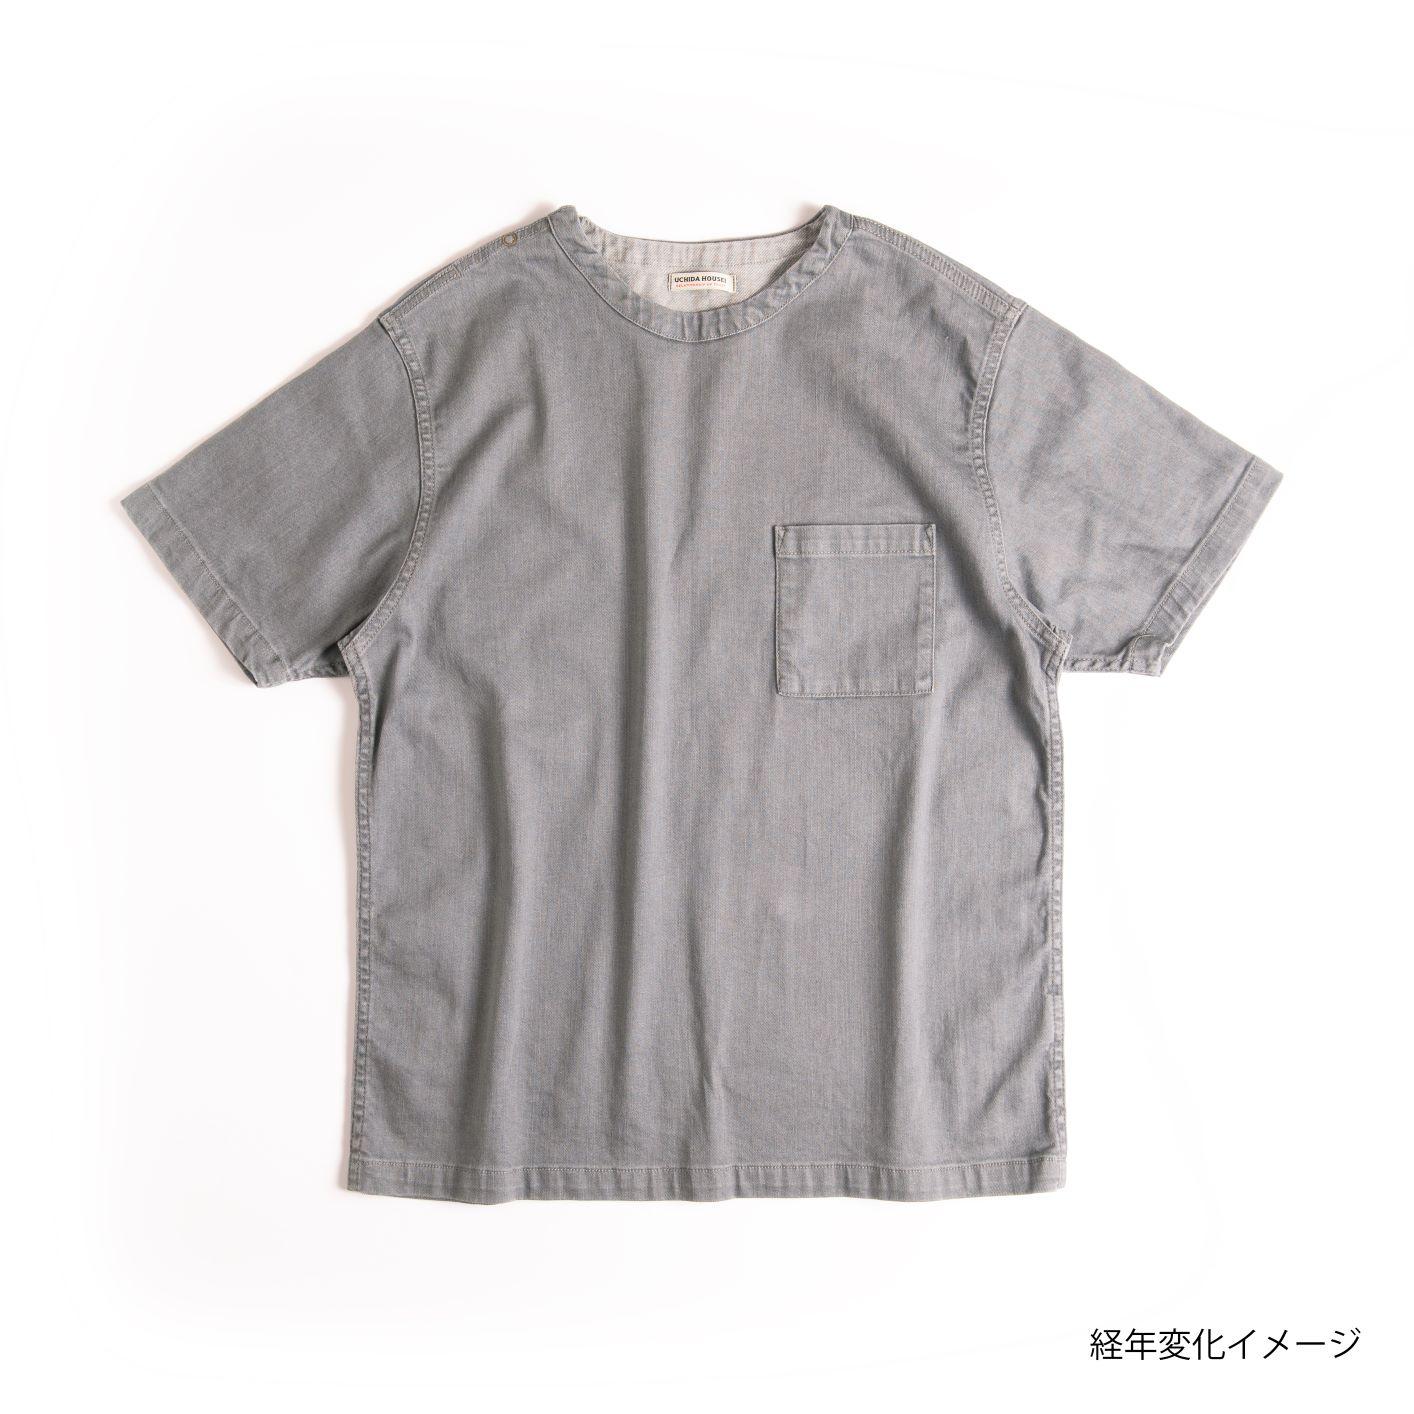 21S Denim T-shirt【デニムTシャツ】